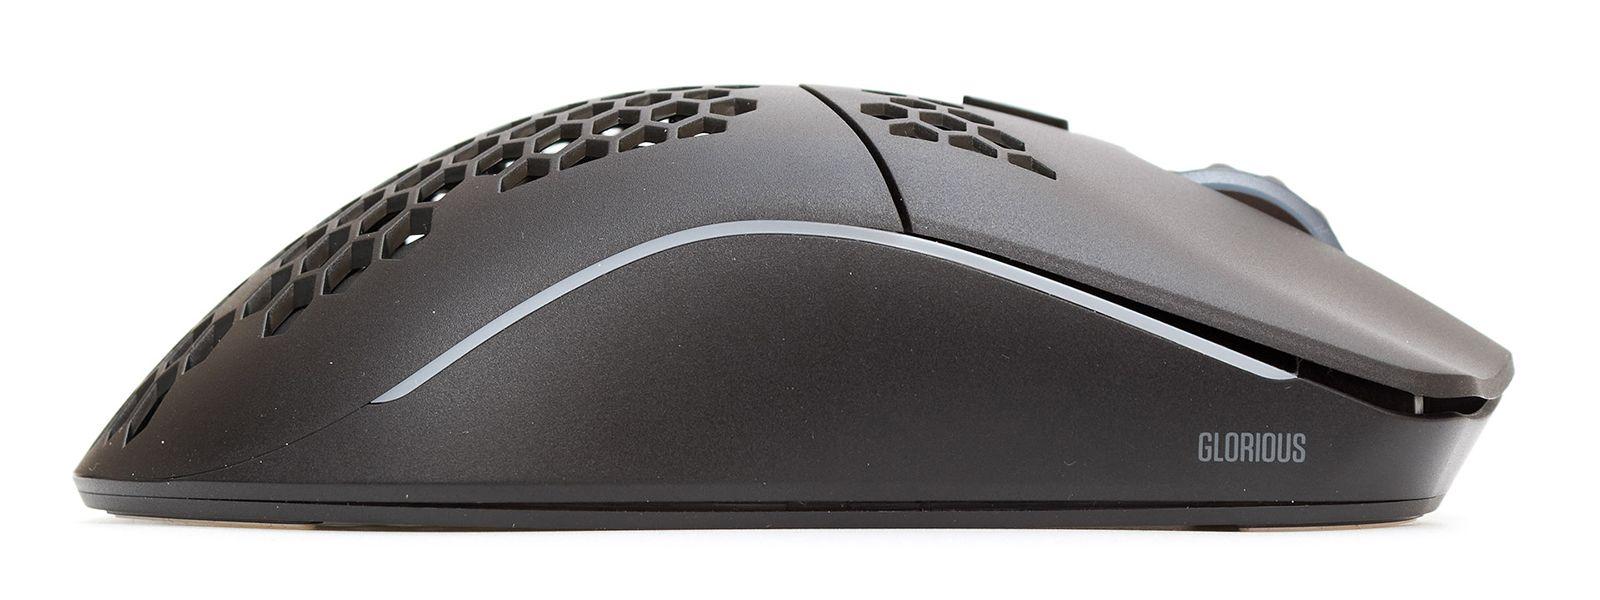 Мышь Glorious Model O Wireless. Фото 11